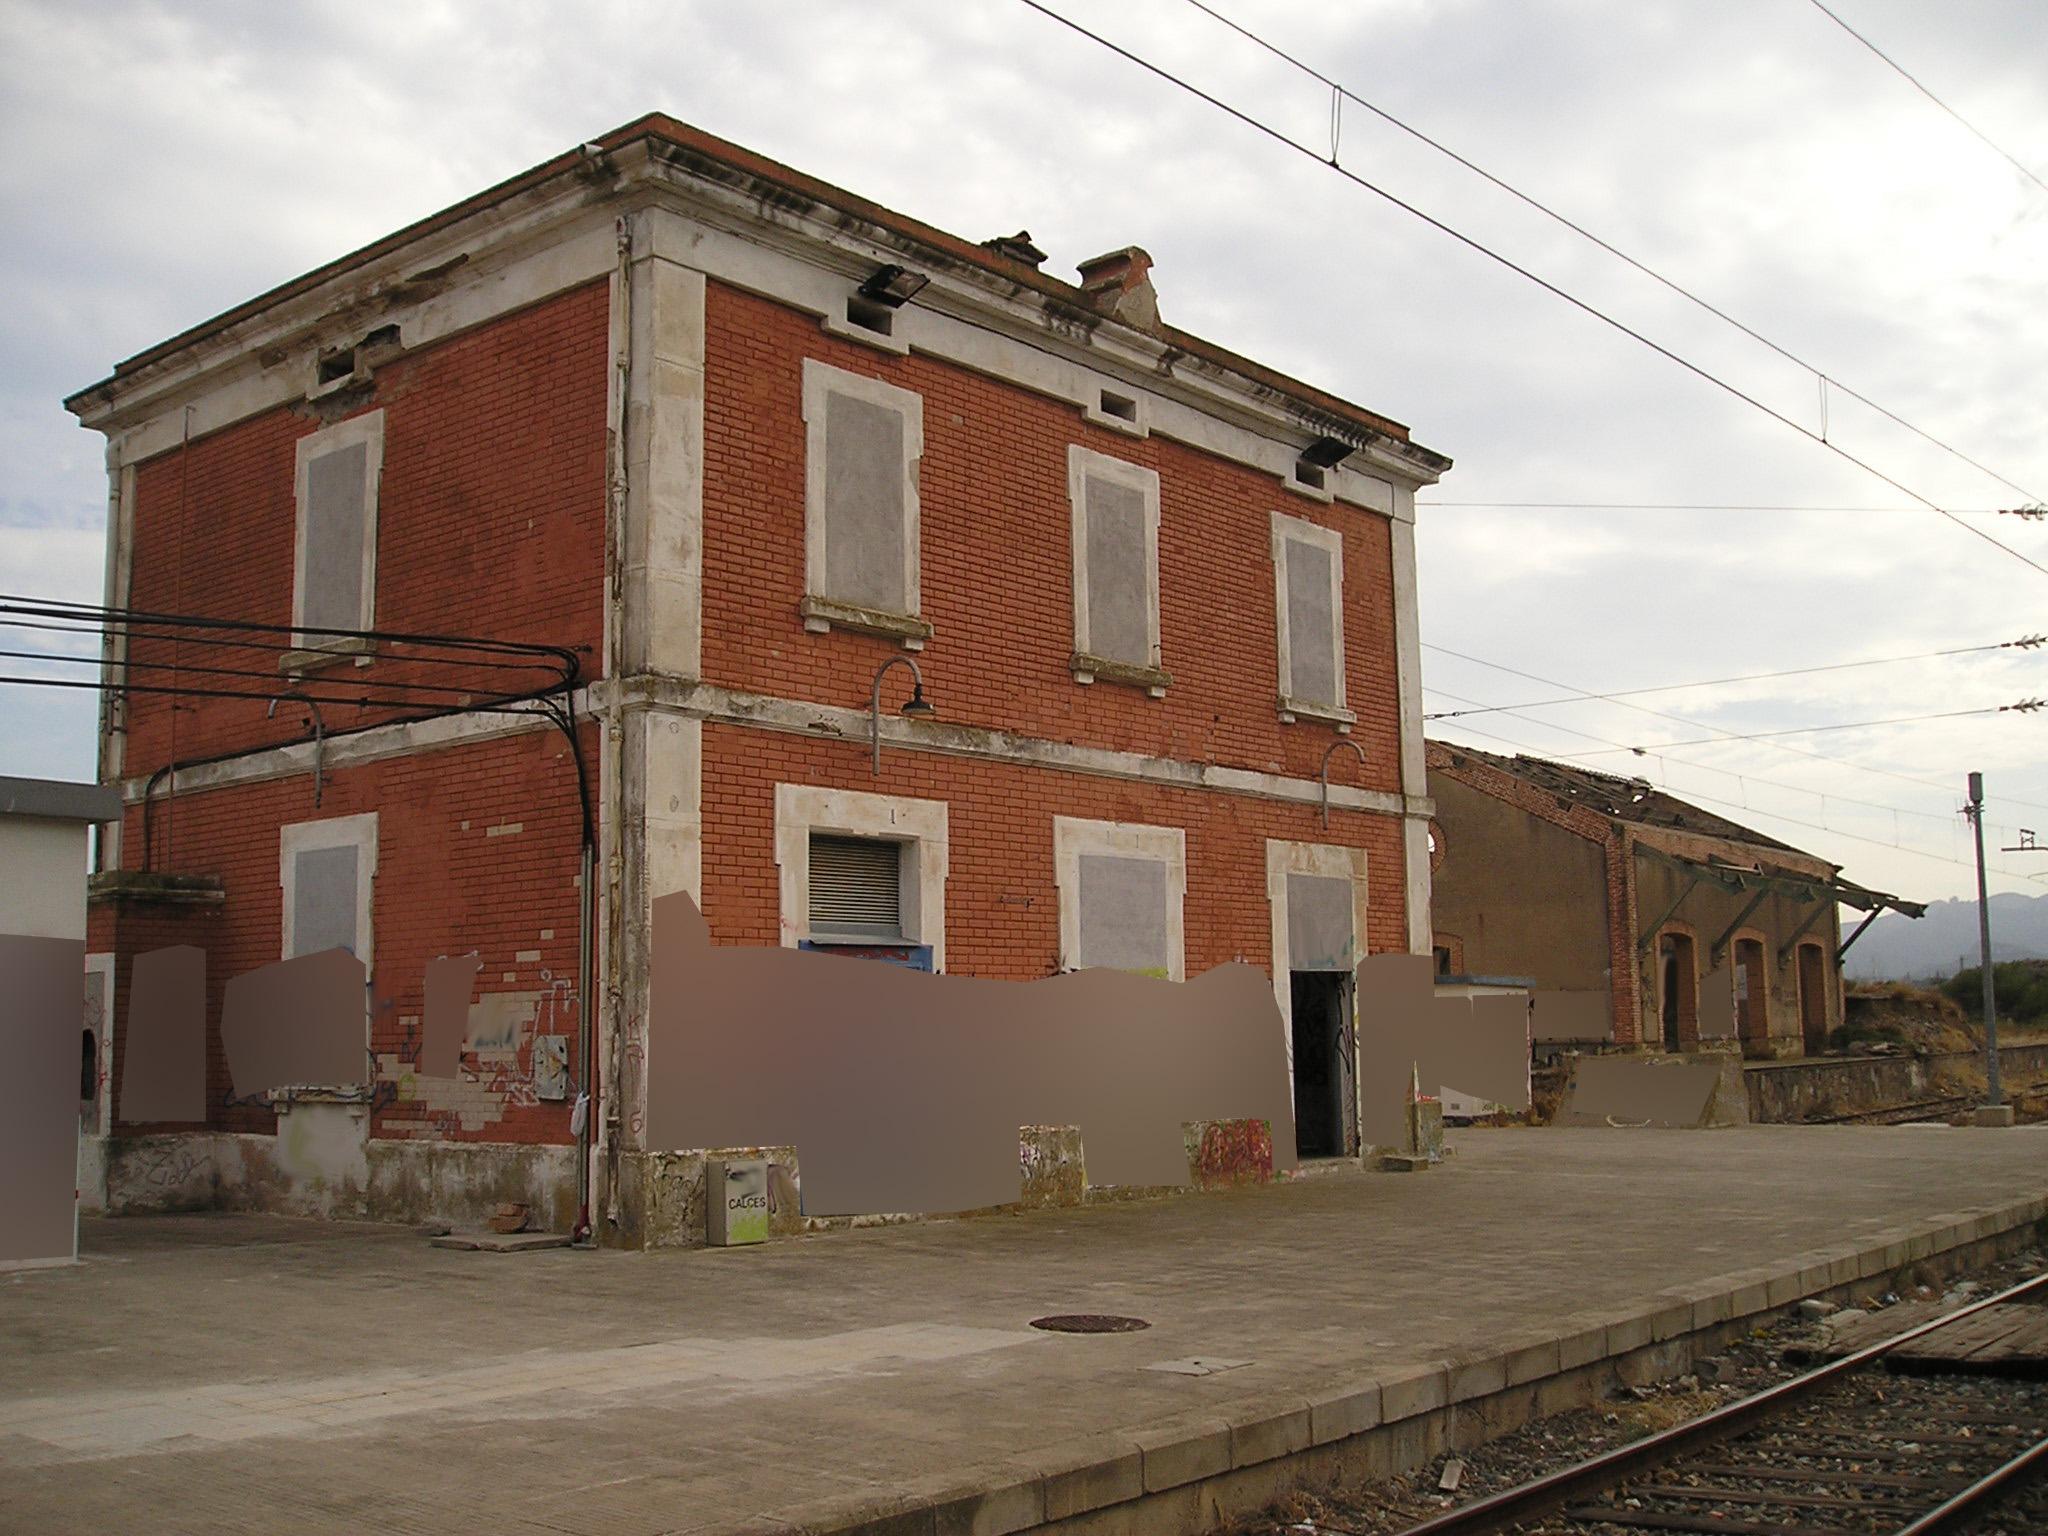 Renfe / ADIF: Riudecanyes-Botarell